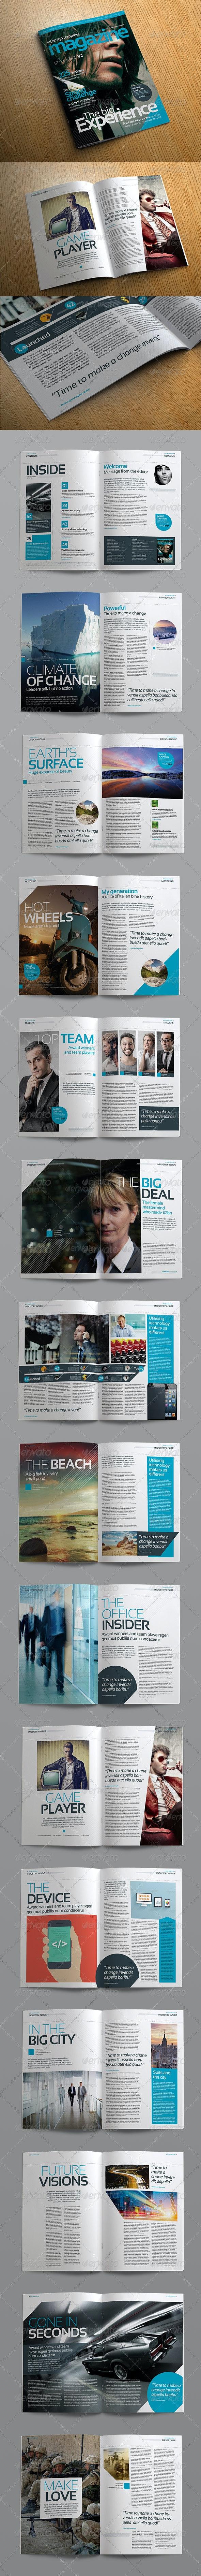 Stylish Volume 2 InDesign Magazine Template - Magazines Print Templates